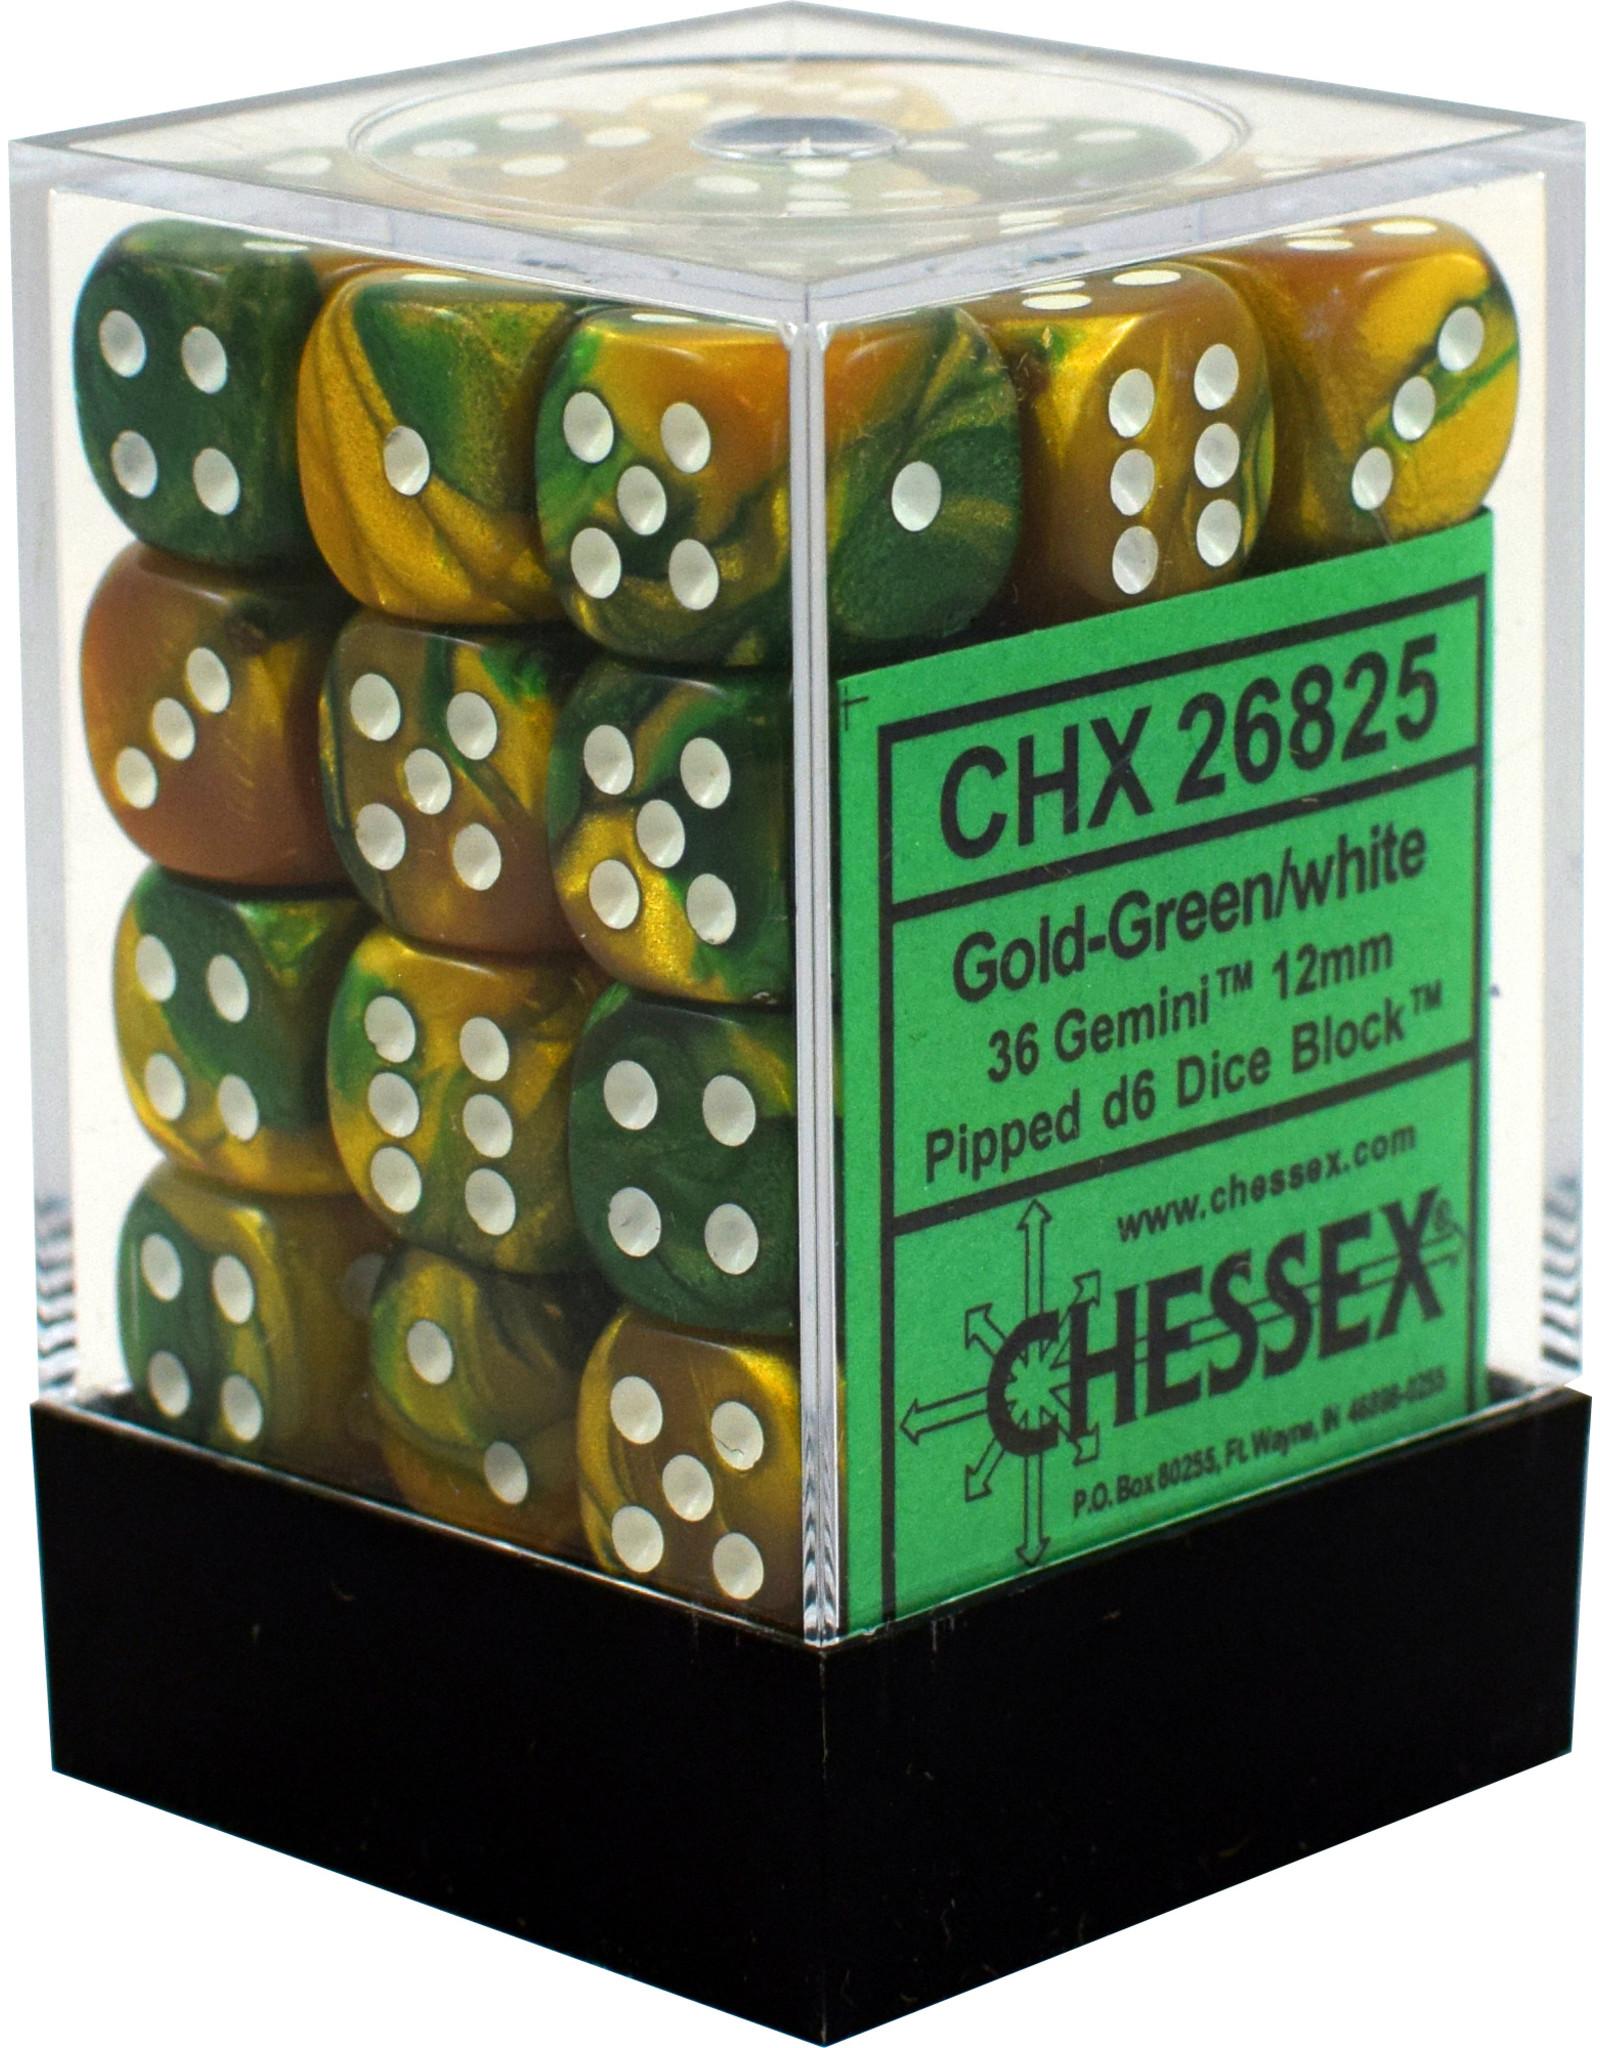 CHESSEX CHX 26825 12MM D6 DICE SET GOLD GREEN W/WHITE GEMINI